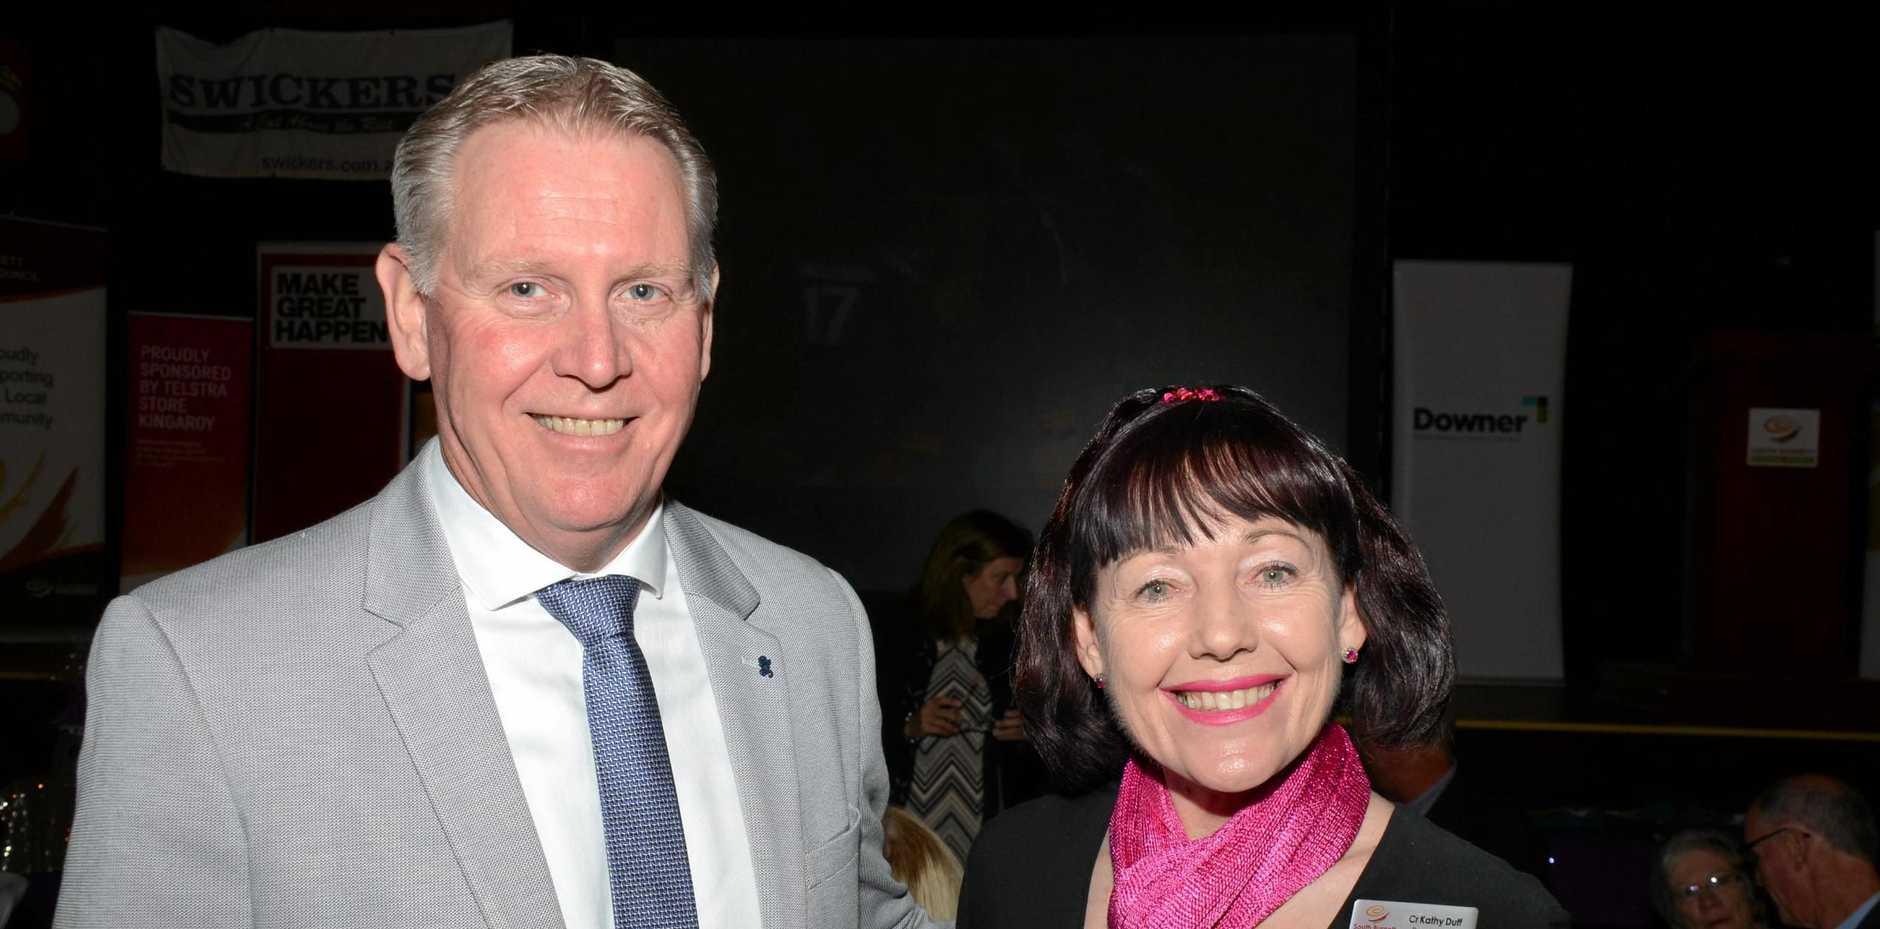 John Carey with South Burnett Deputy Mayor Kathy Duff.